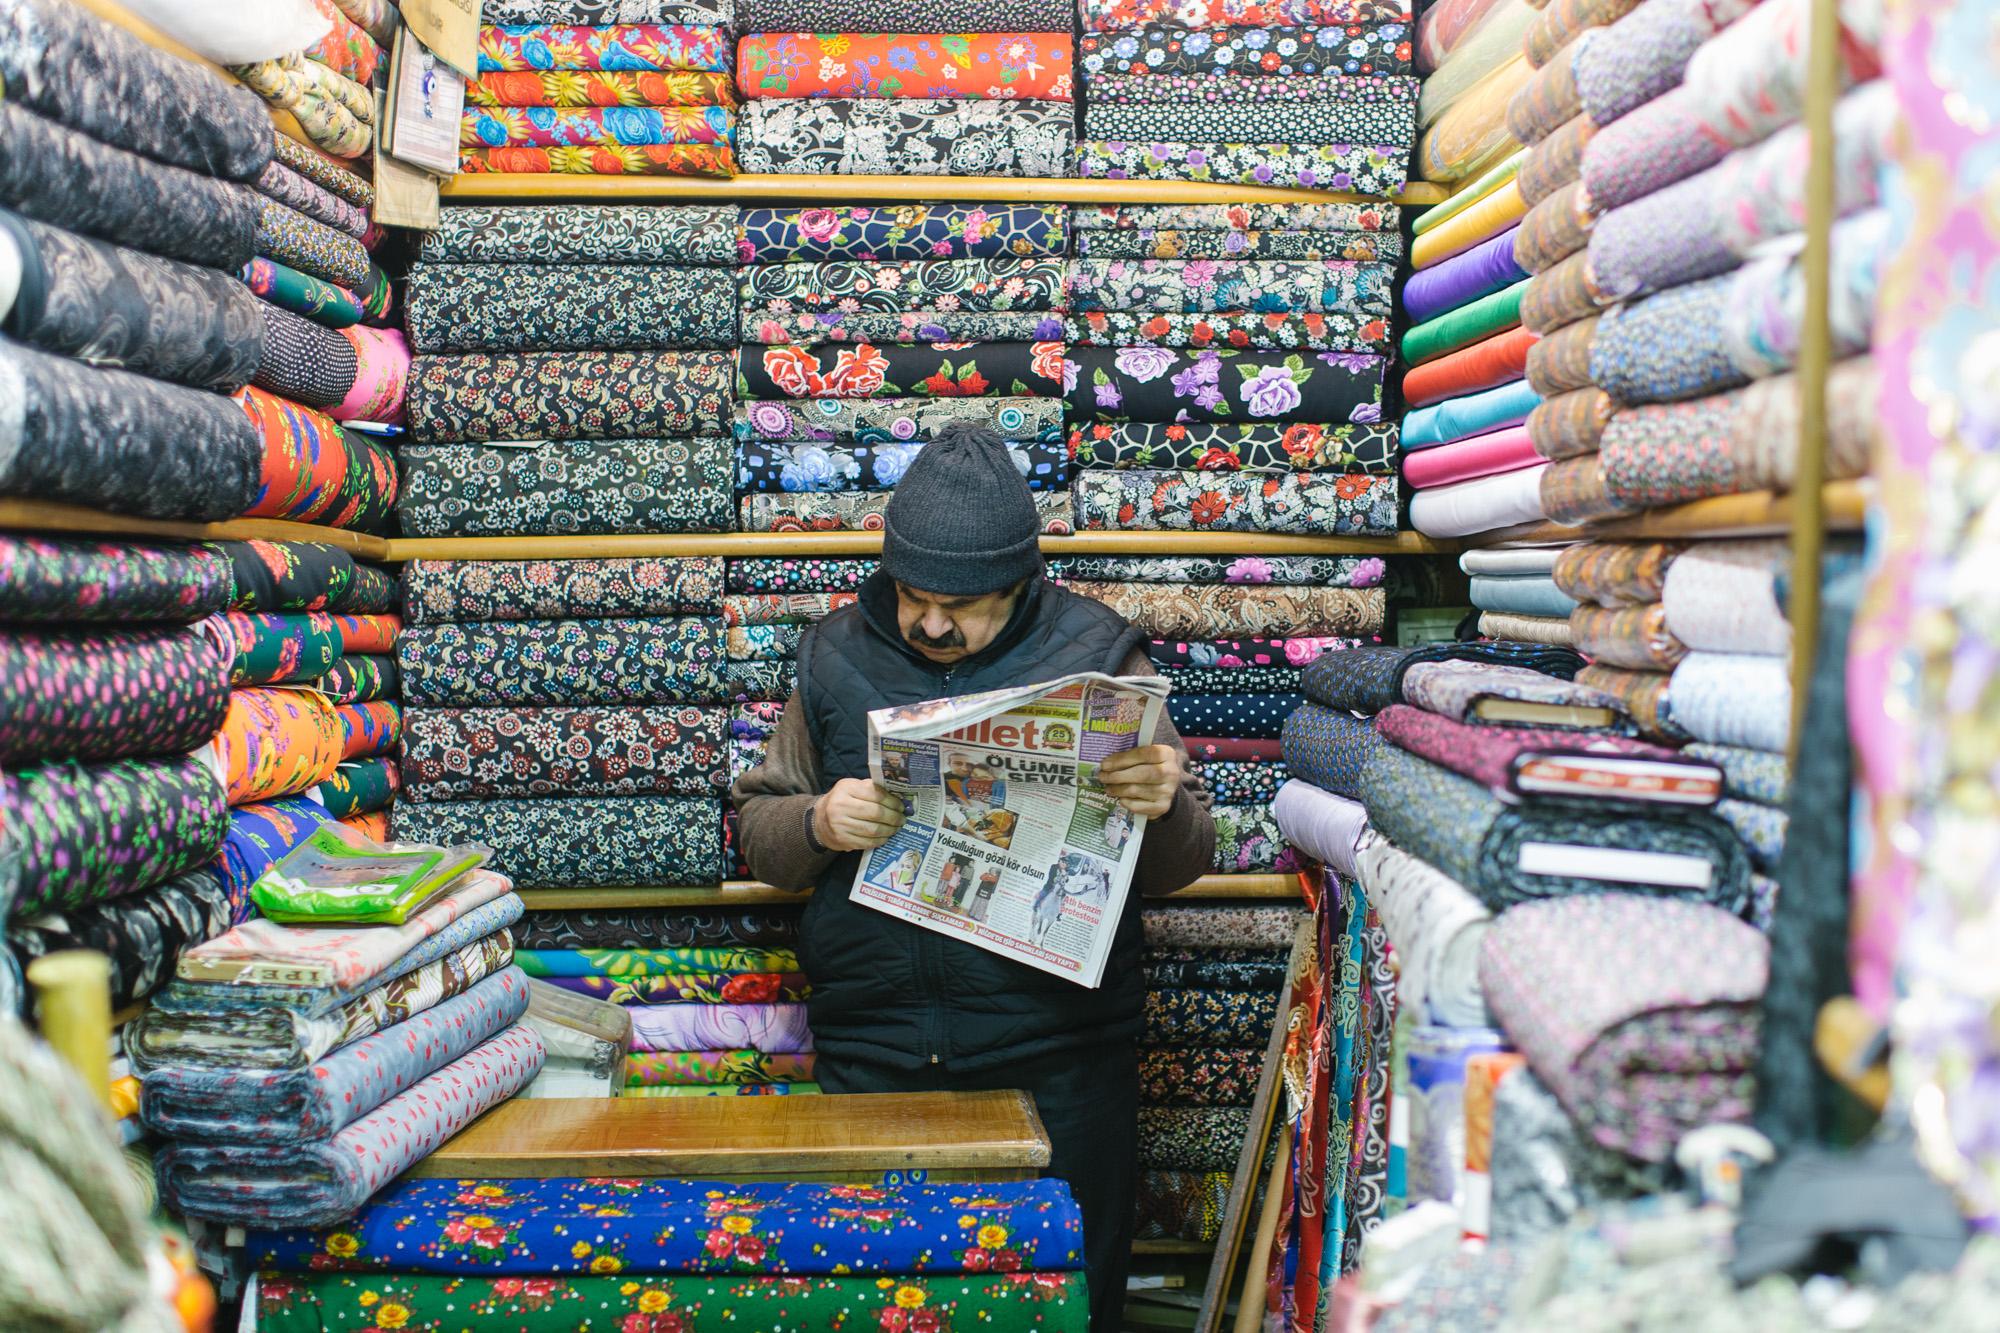 Istanbul_Grand_Bazaar-AudiMagazine-FinnBeales-03.jpg